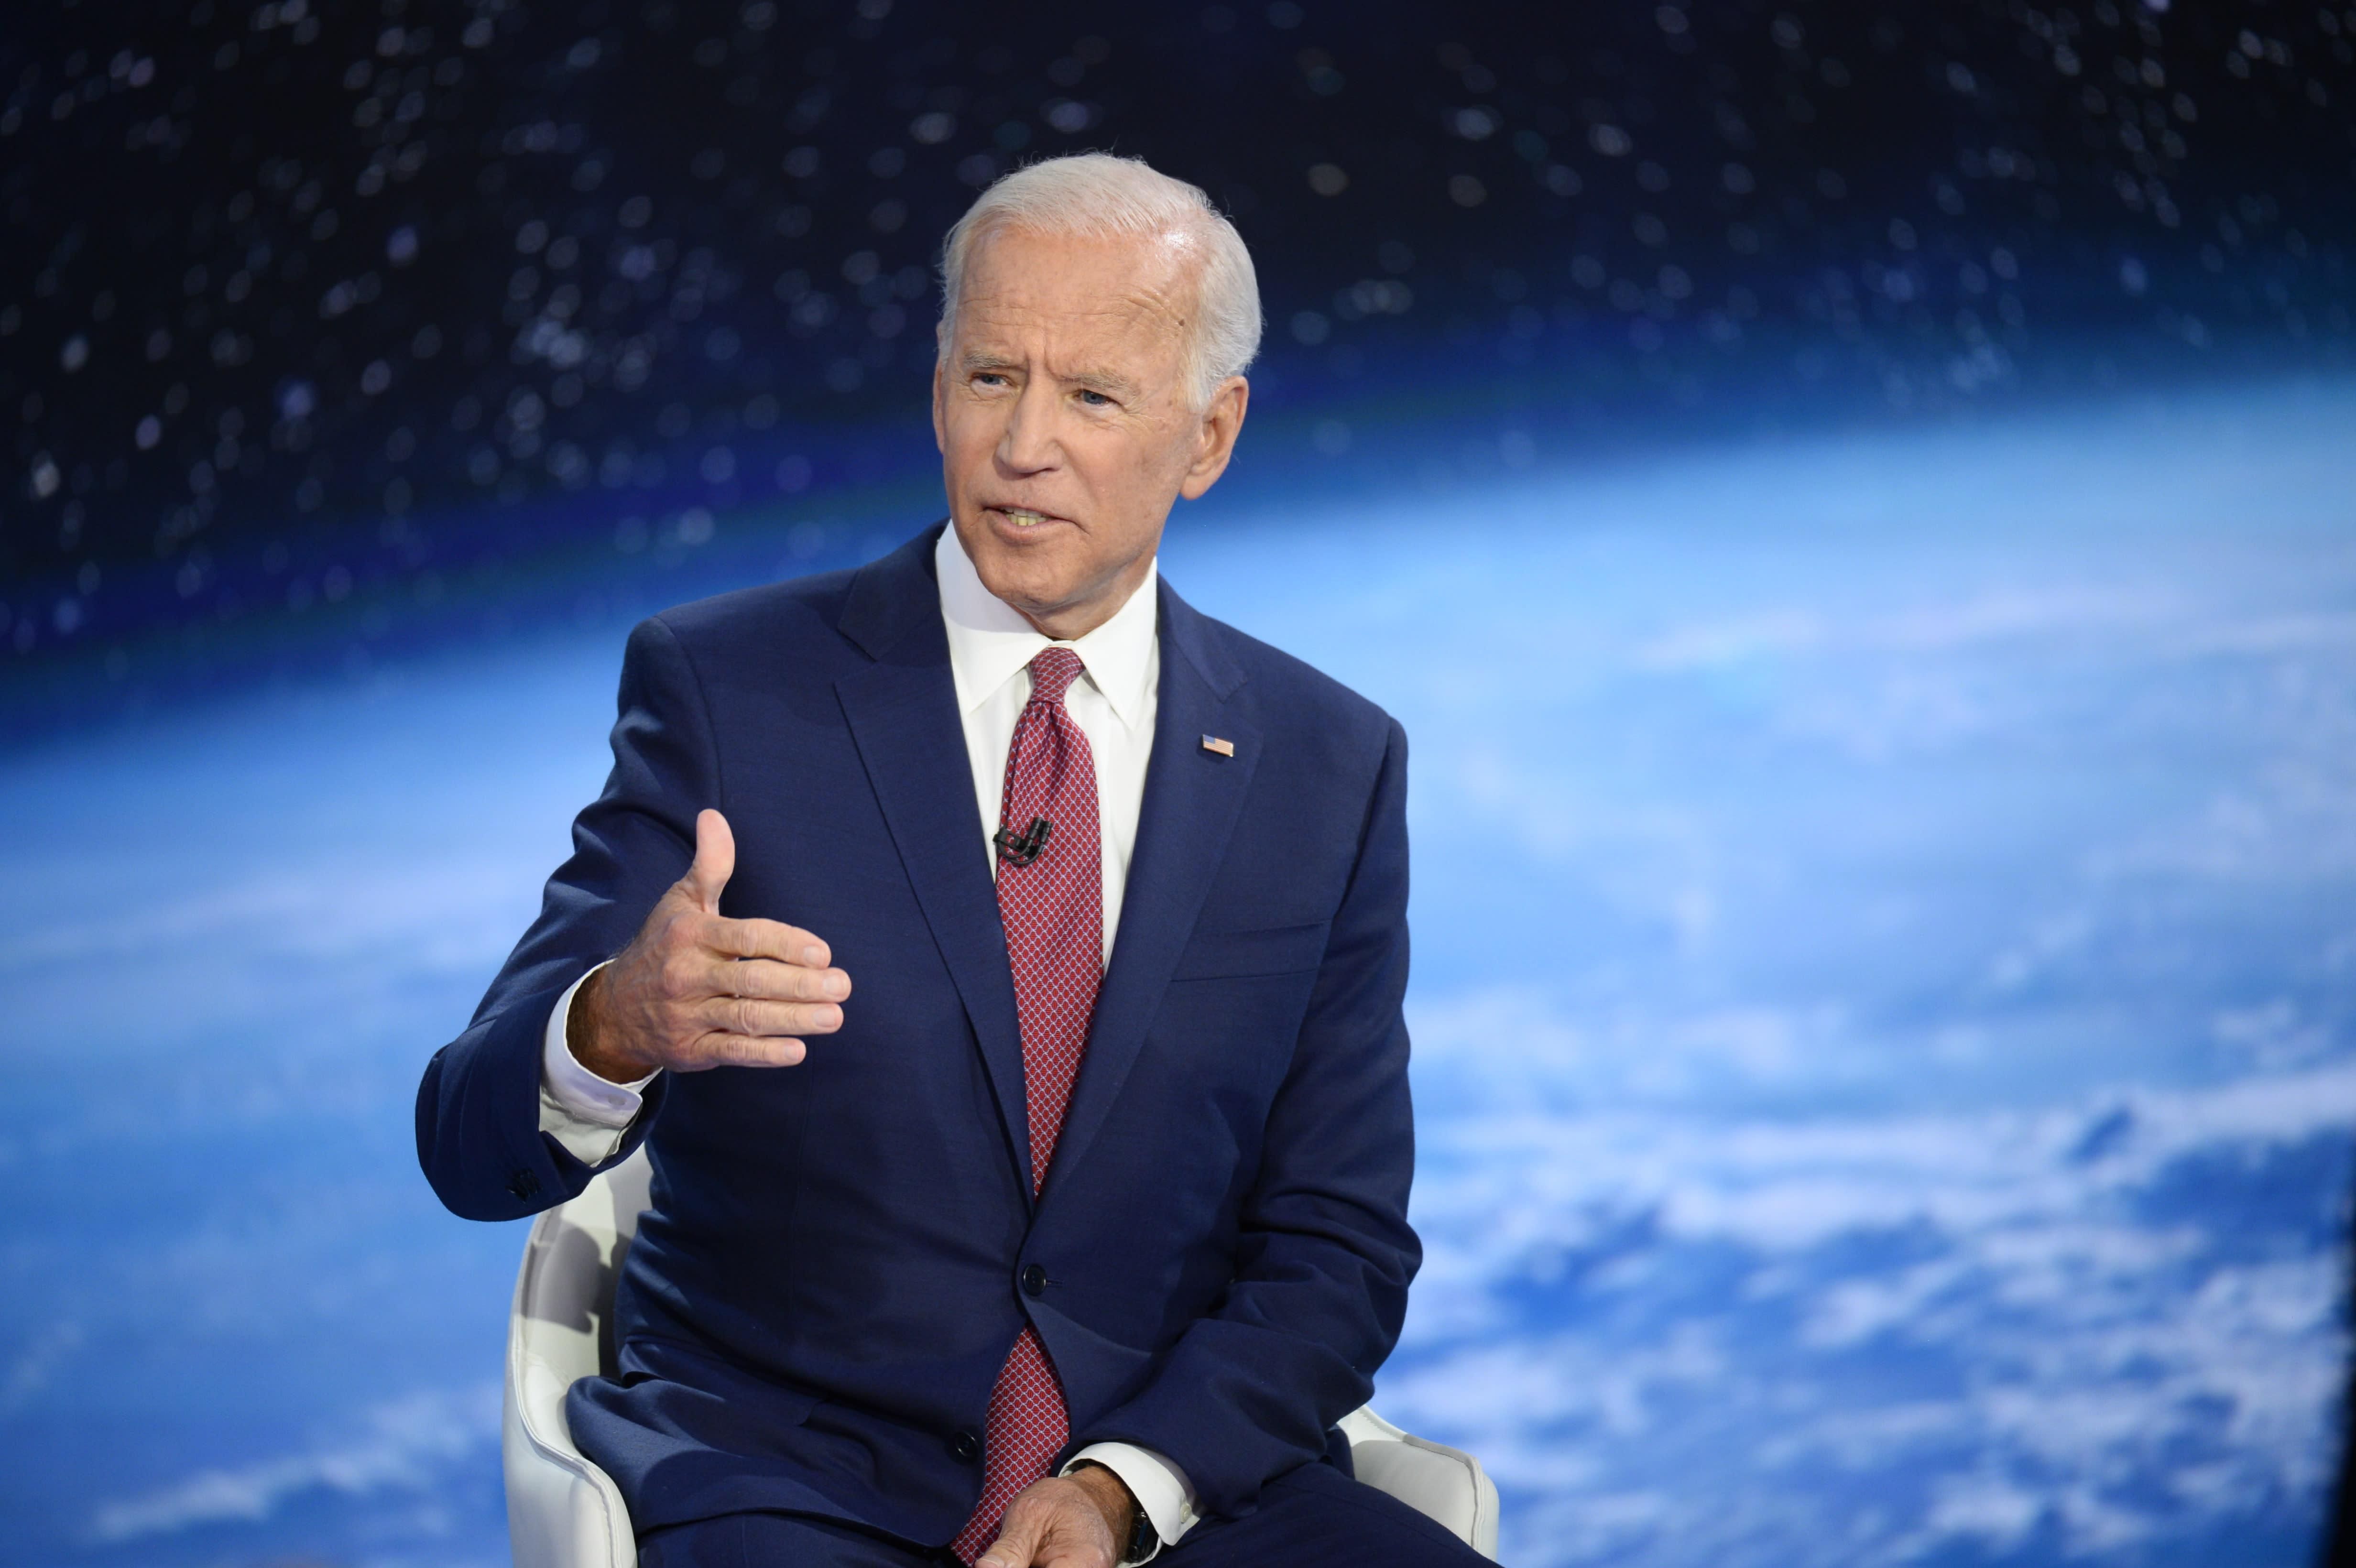 2020 Vision: Biden on defensive in climate forum